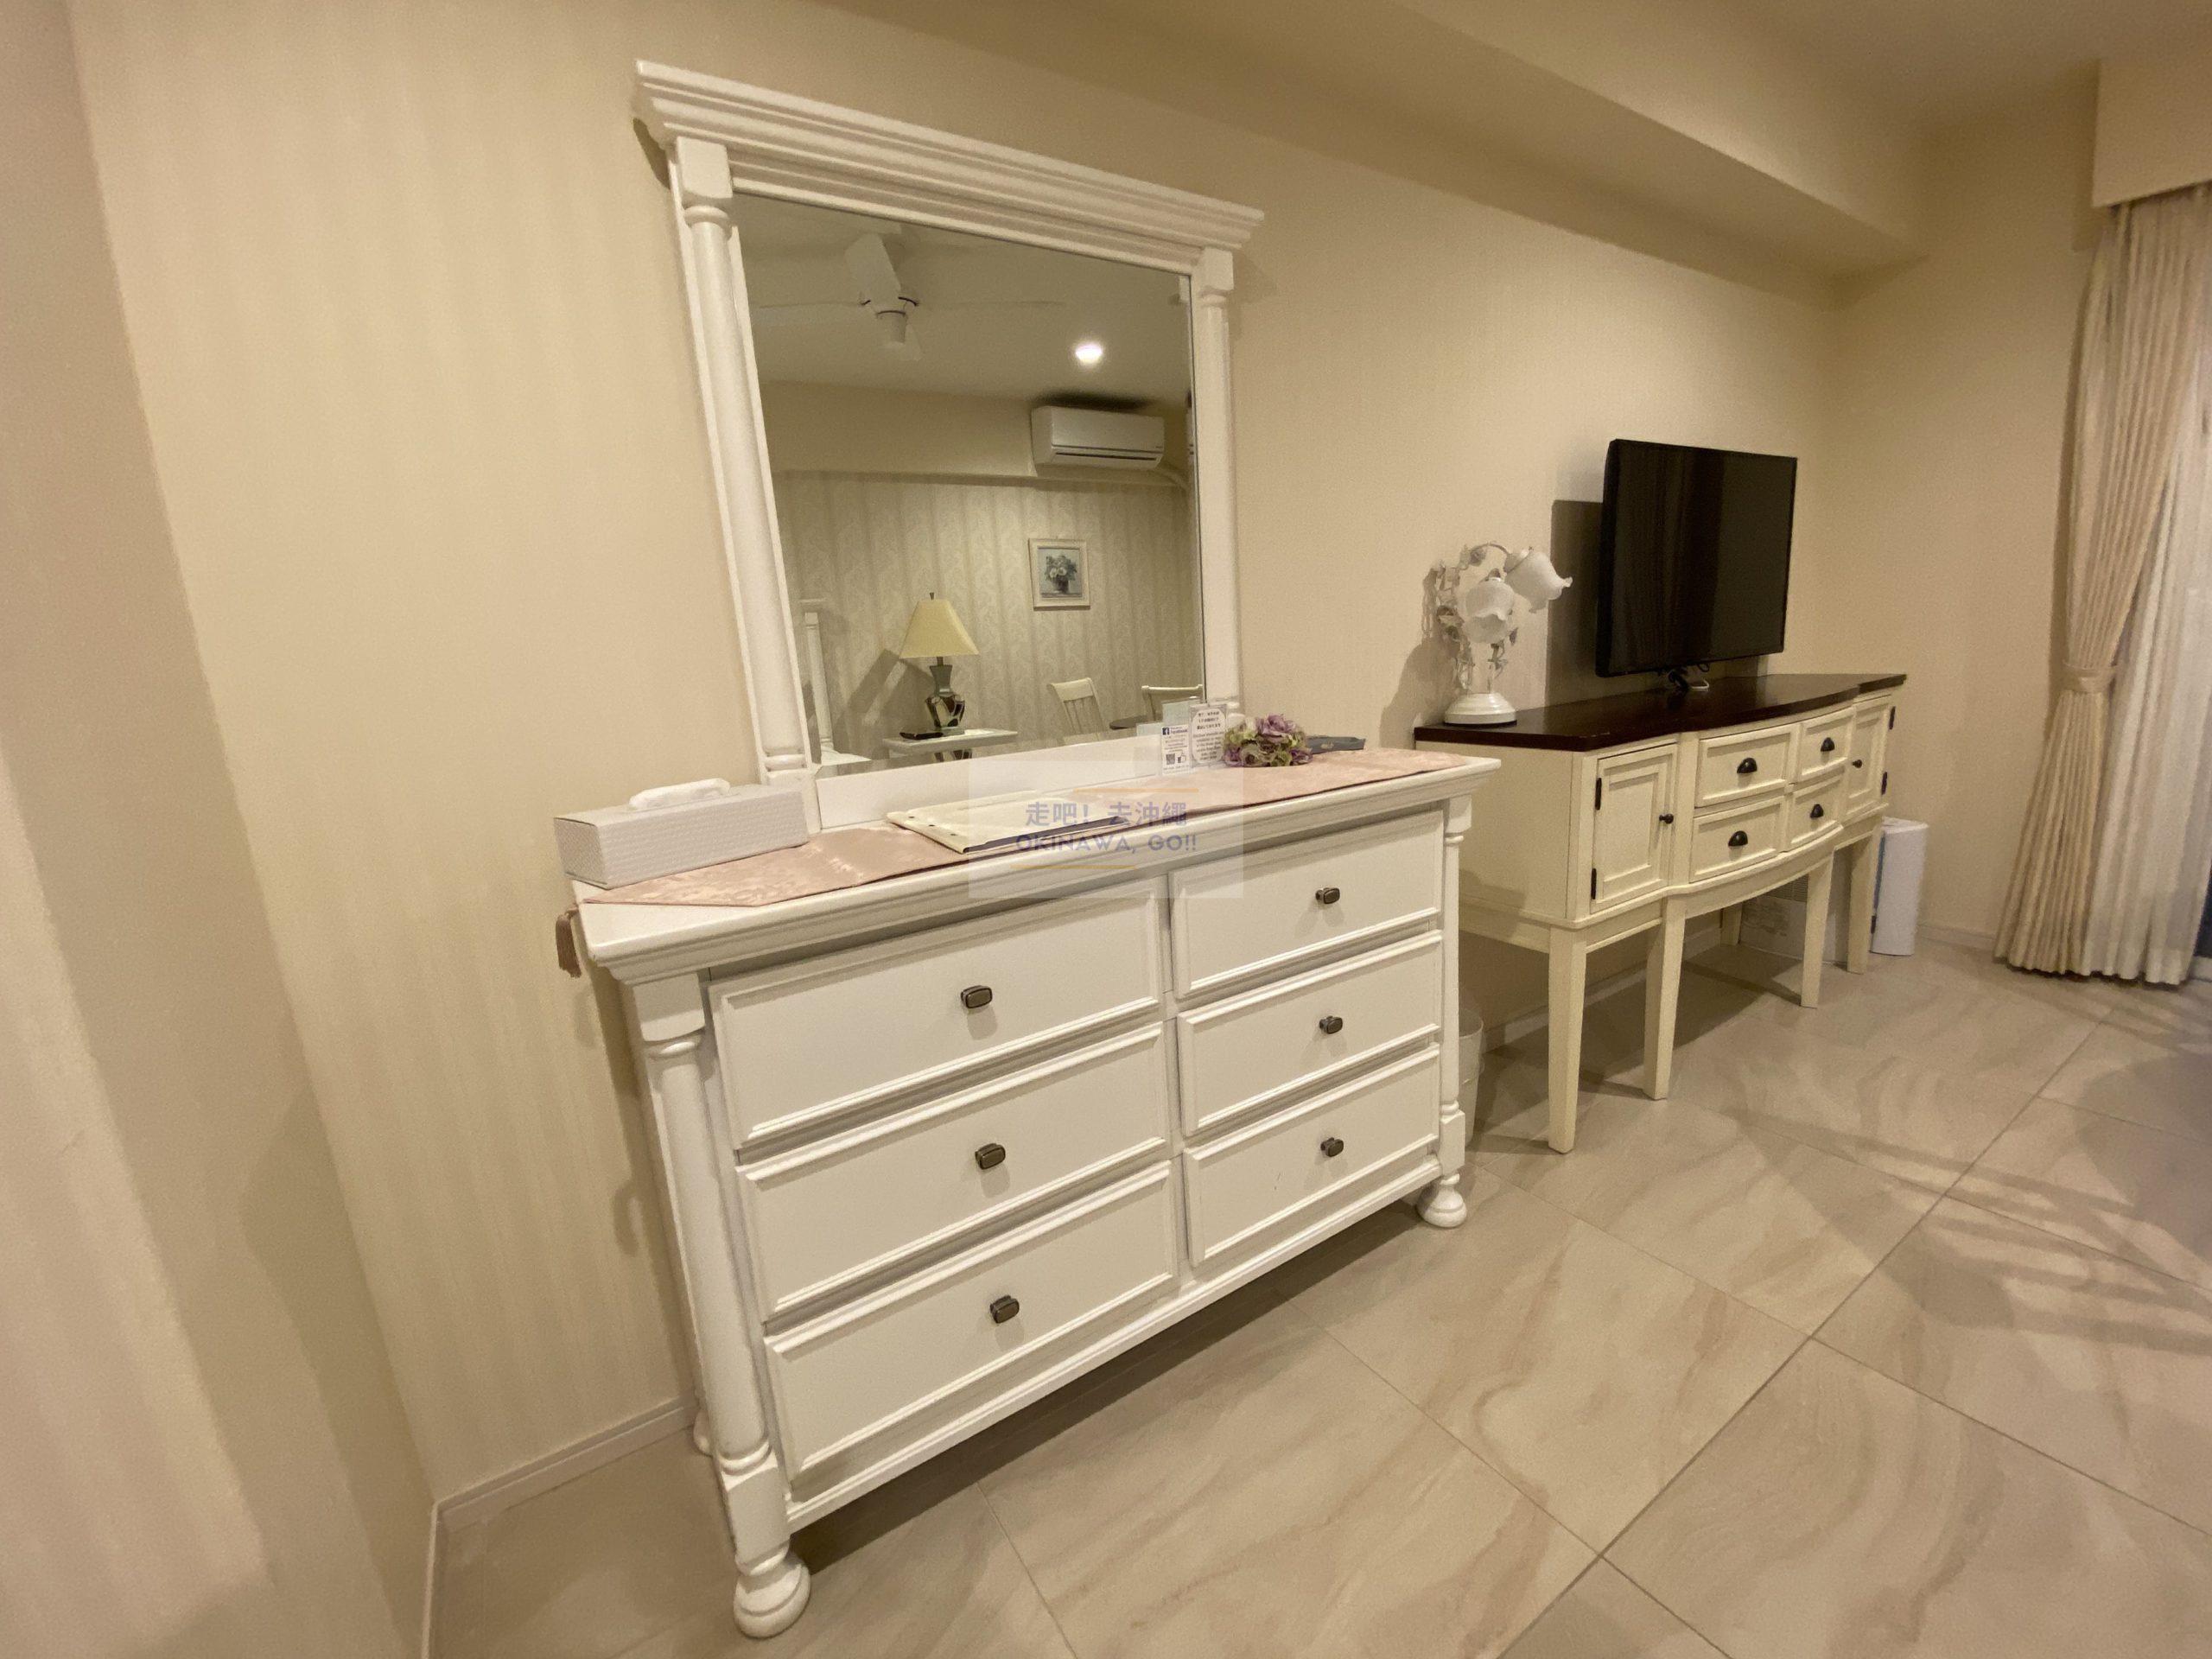 Wisteria公寓度假村-鏡子、電視櫃